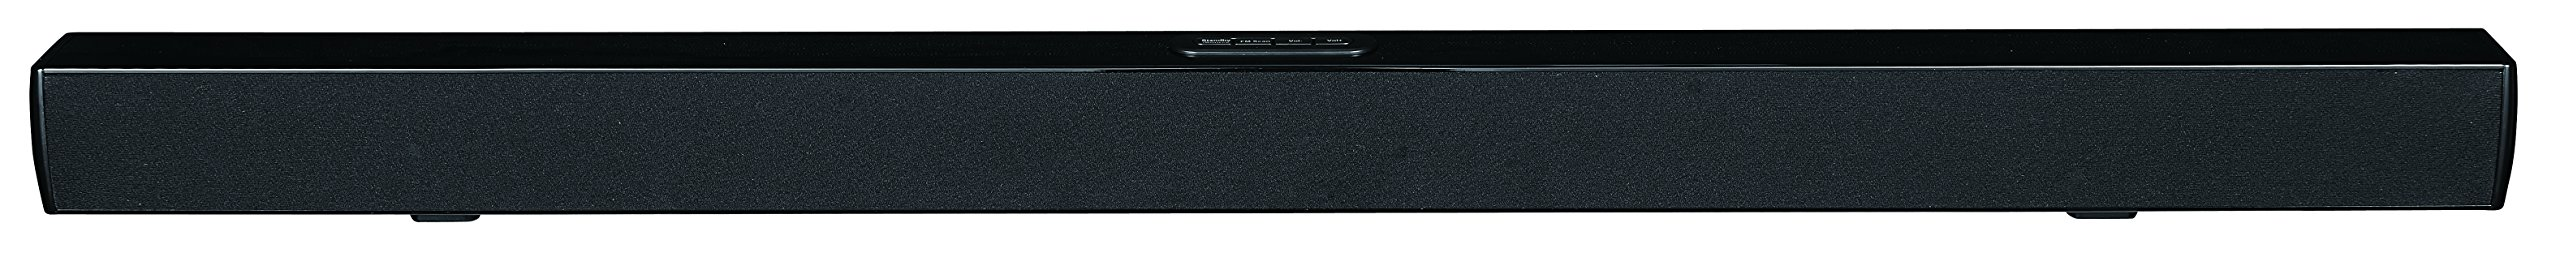 Proscan PSB3713-OP 37-Inch Bluetooth Ultra-Slim Sound Bar with Optical Digital Audio Input